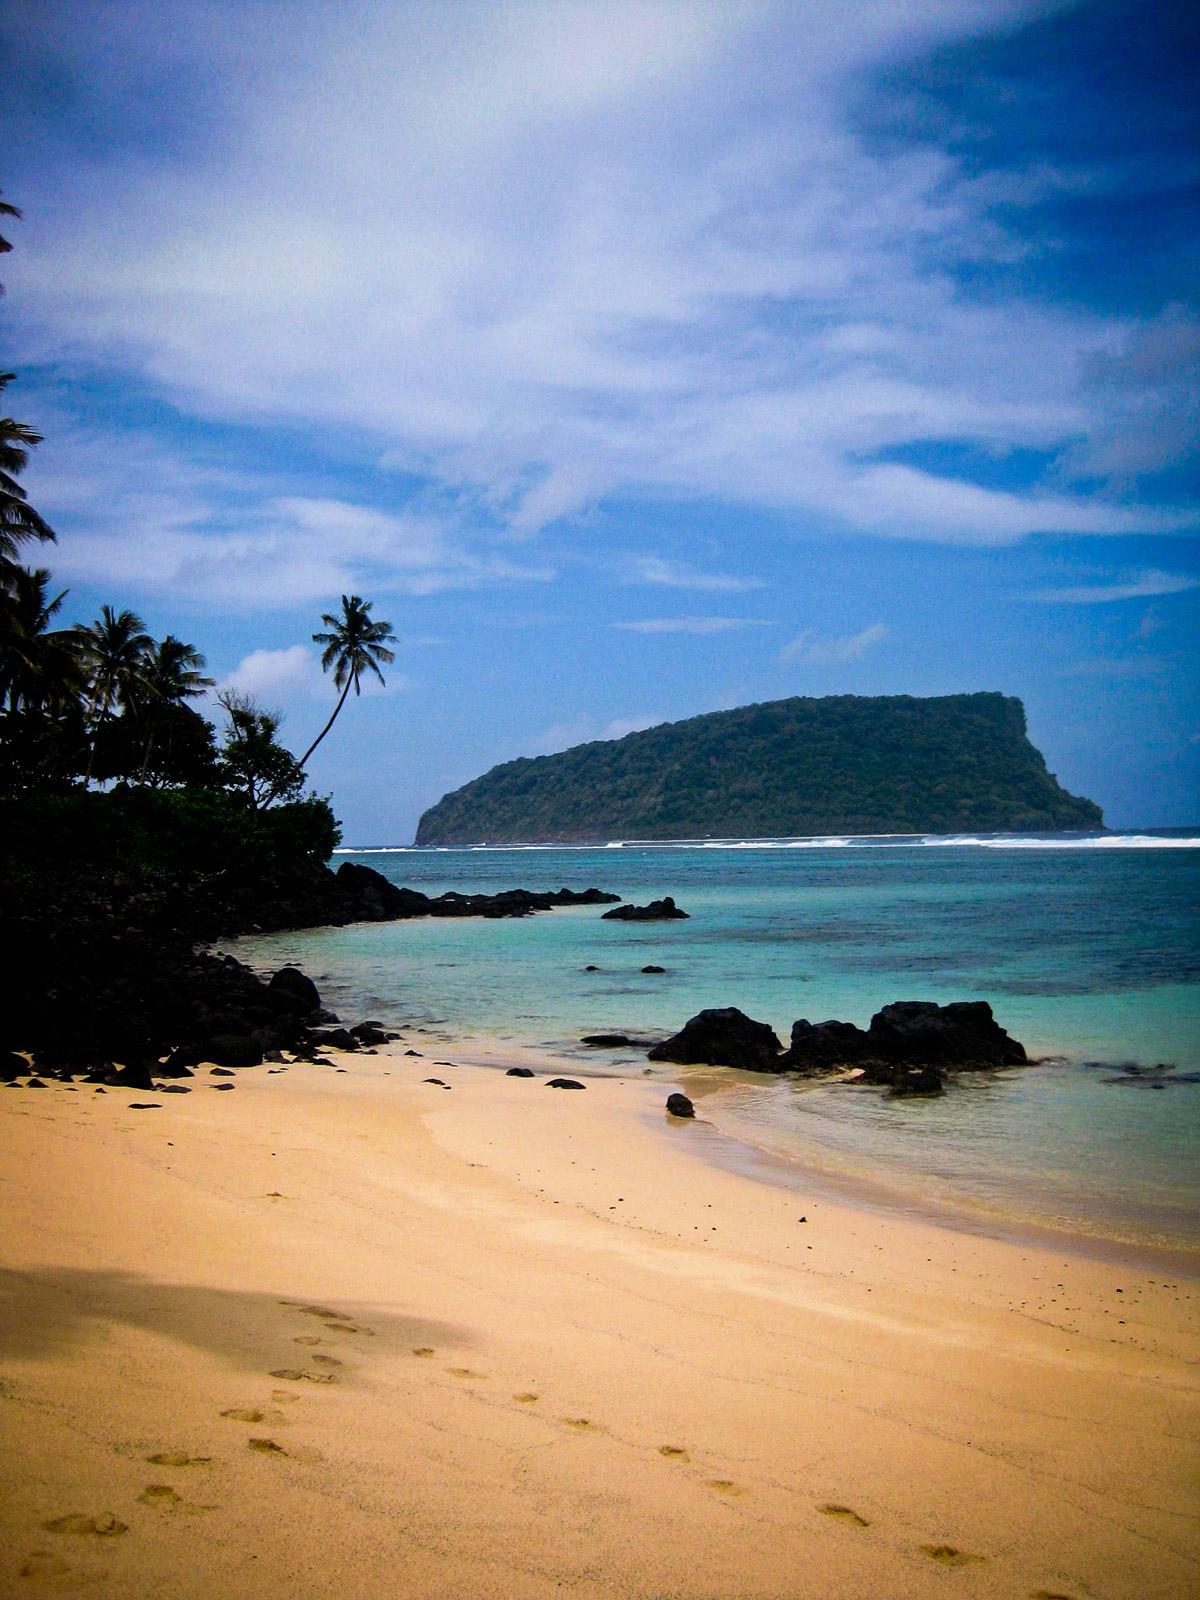 Samoan chat